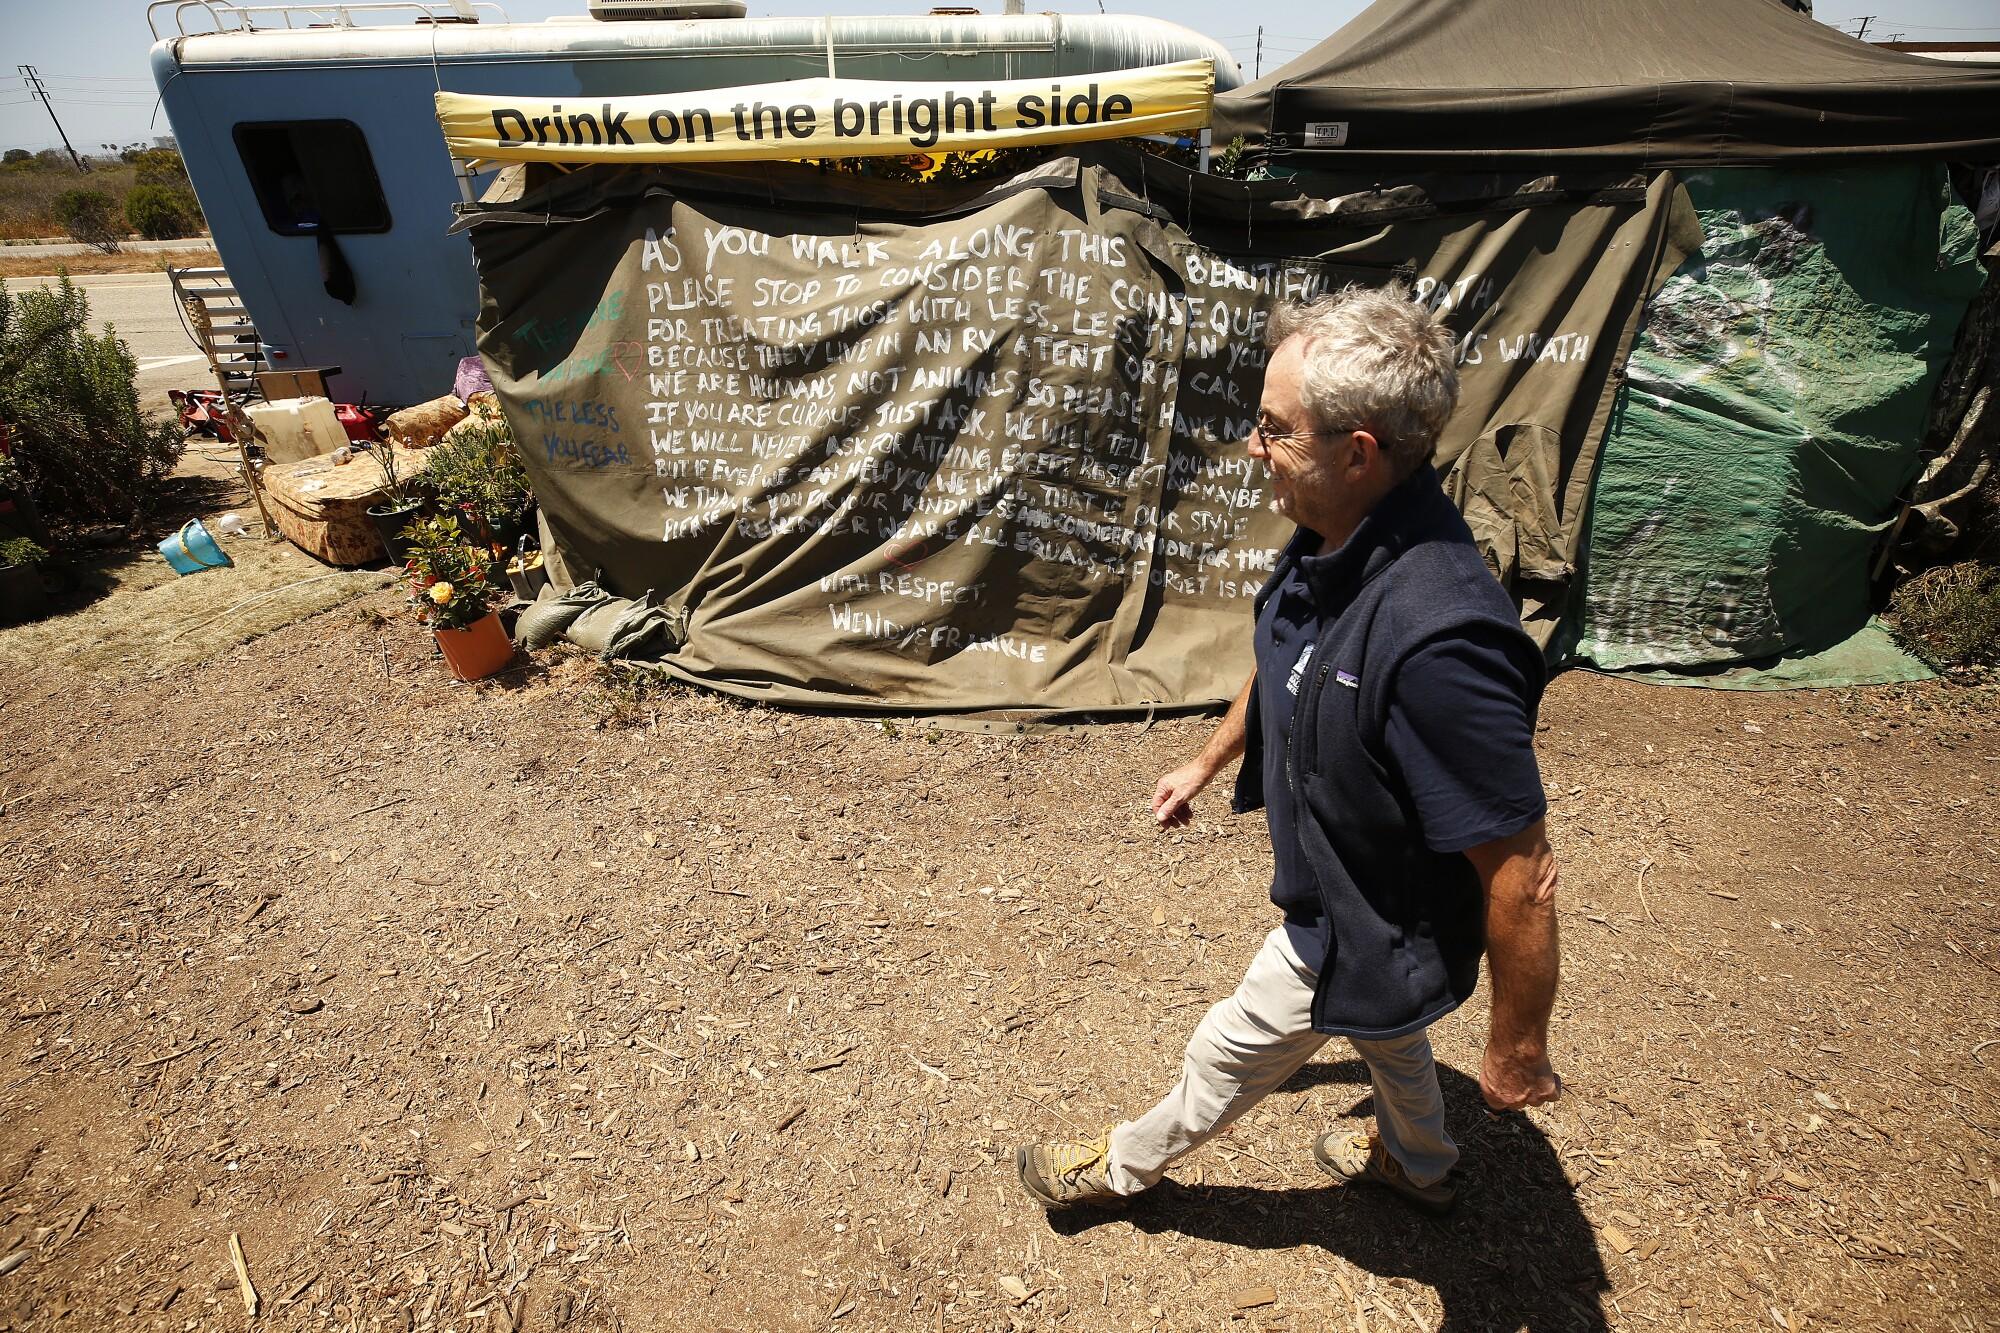 Scott Culbertson, executive director of the Friends of Ballona Wetlands, walks past campers near the Ballona Wetlands.